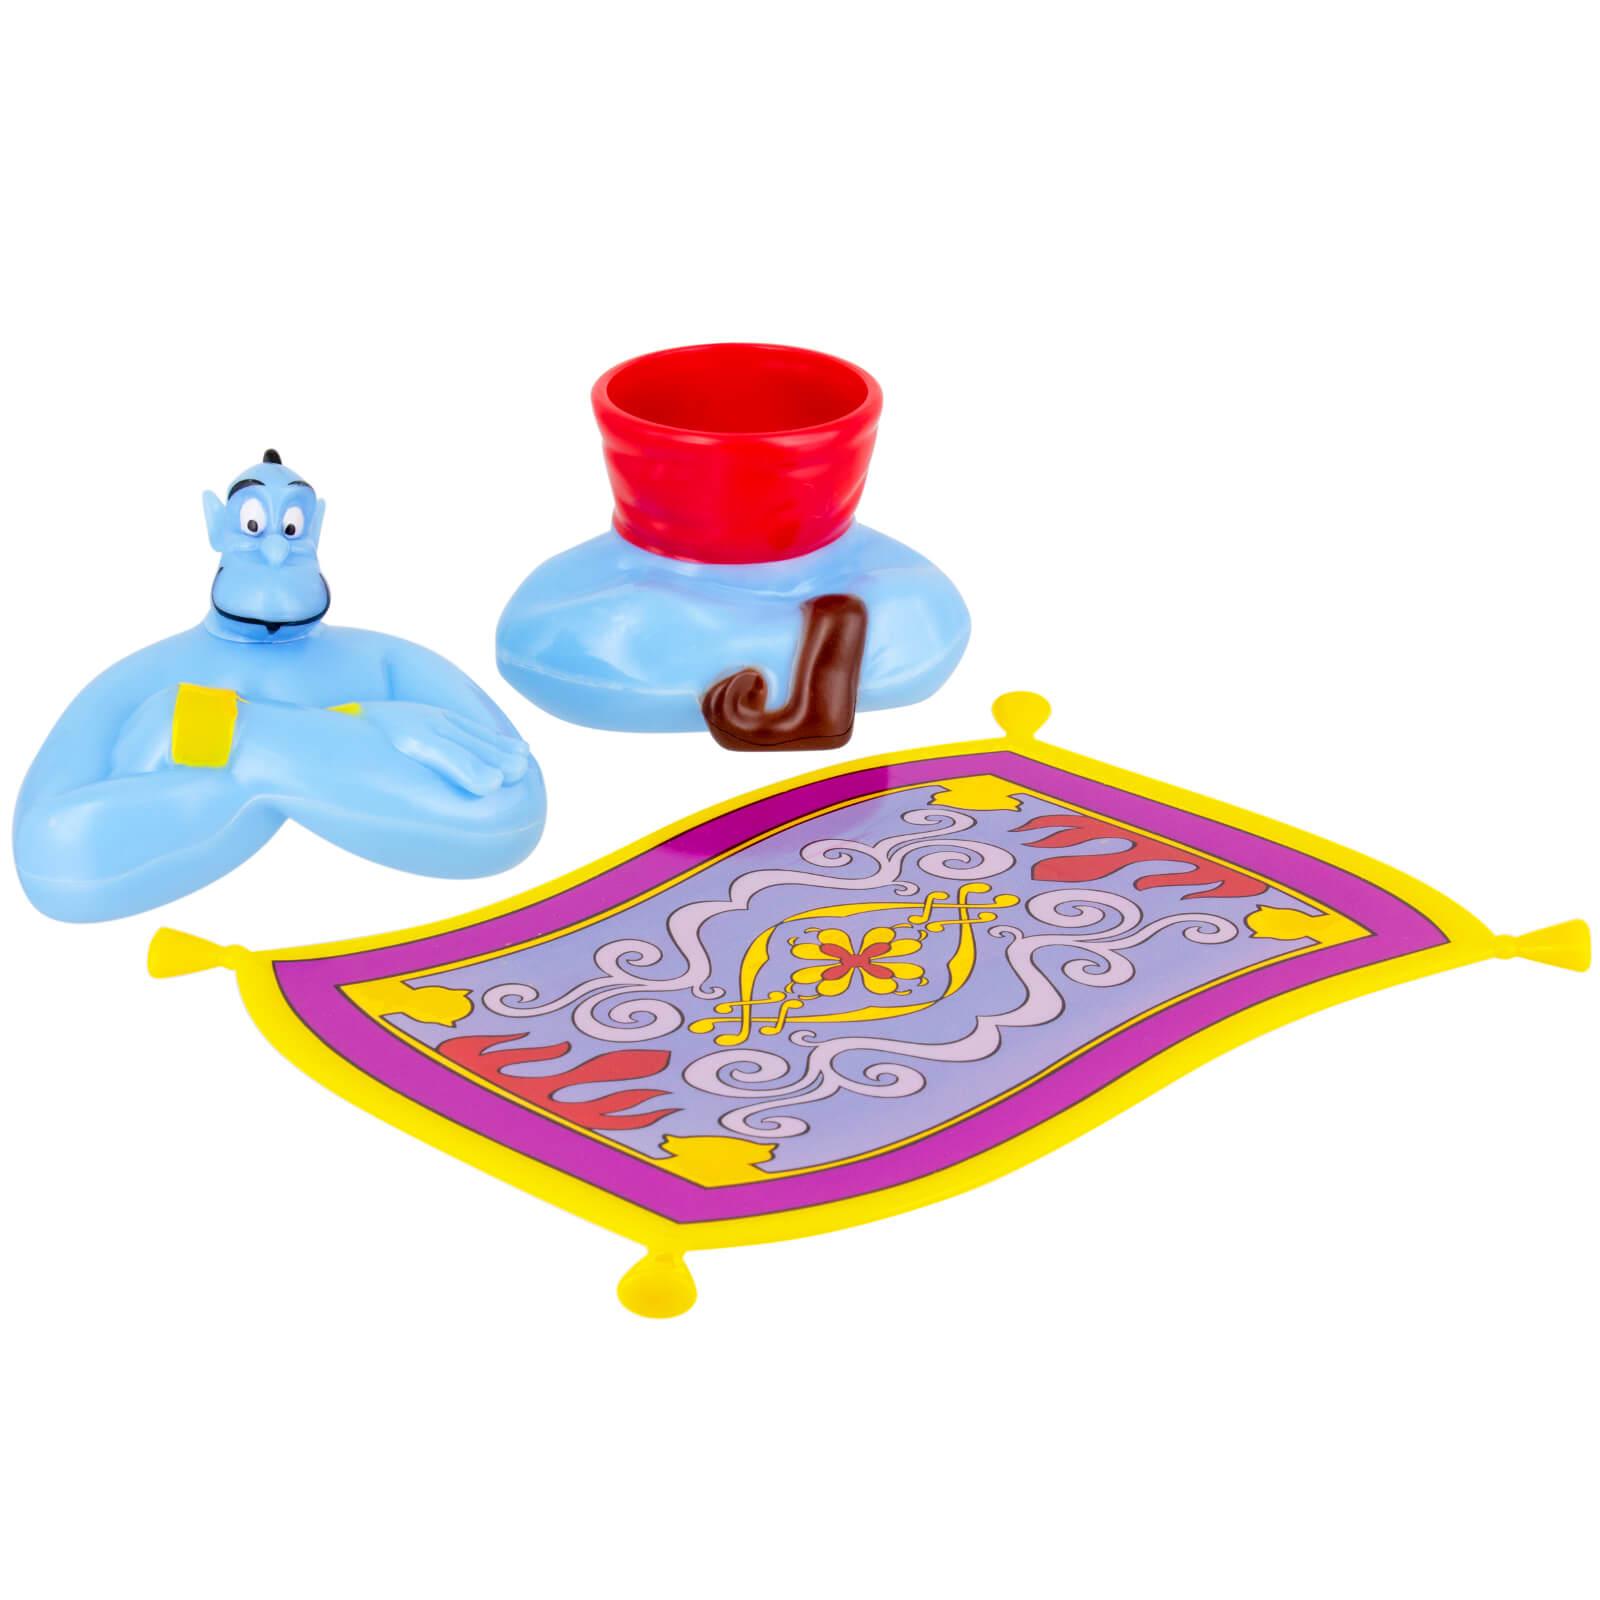 Image of Disney Aladdin Genie Egg Cup